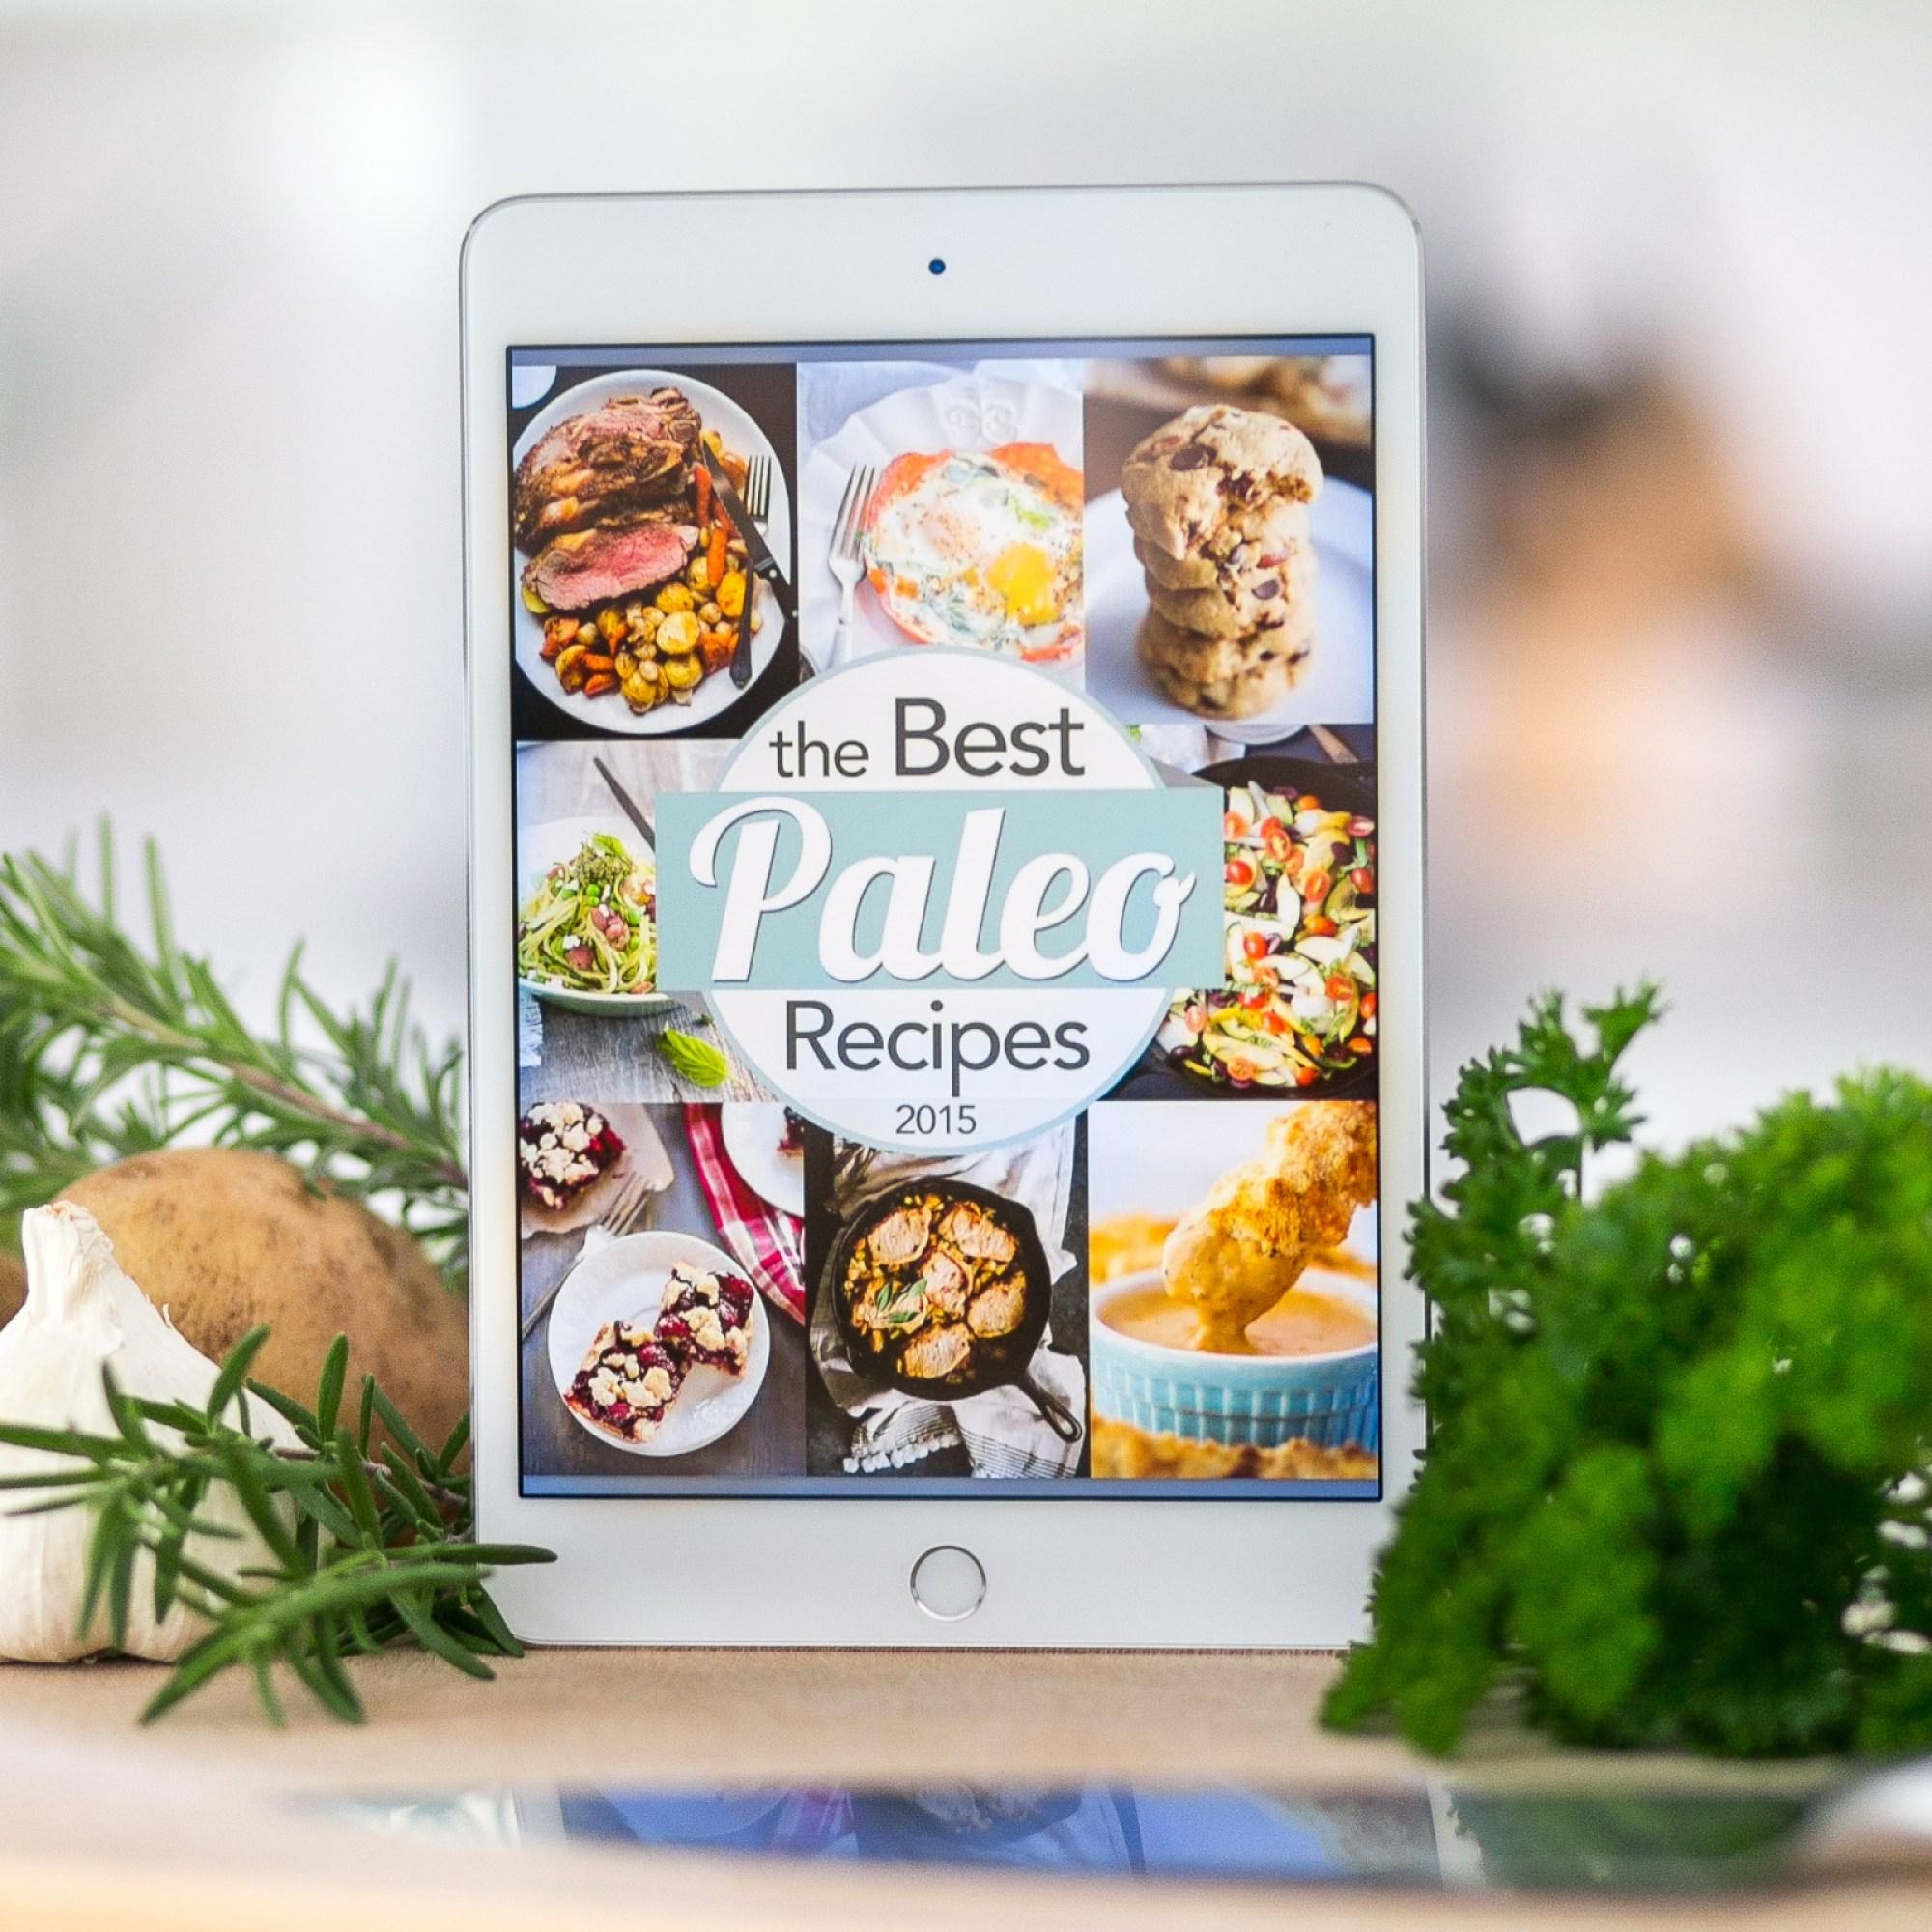 Best Paleo Recipes 2015